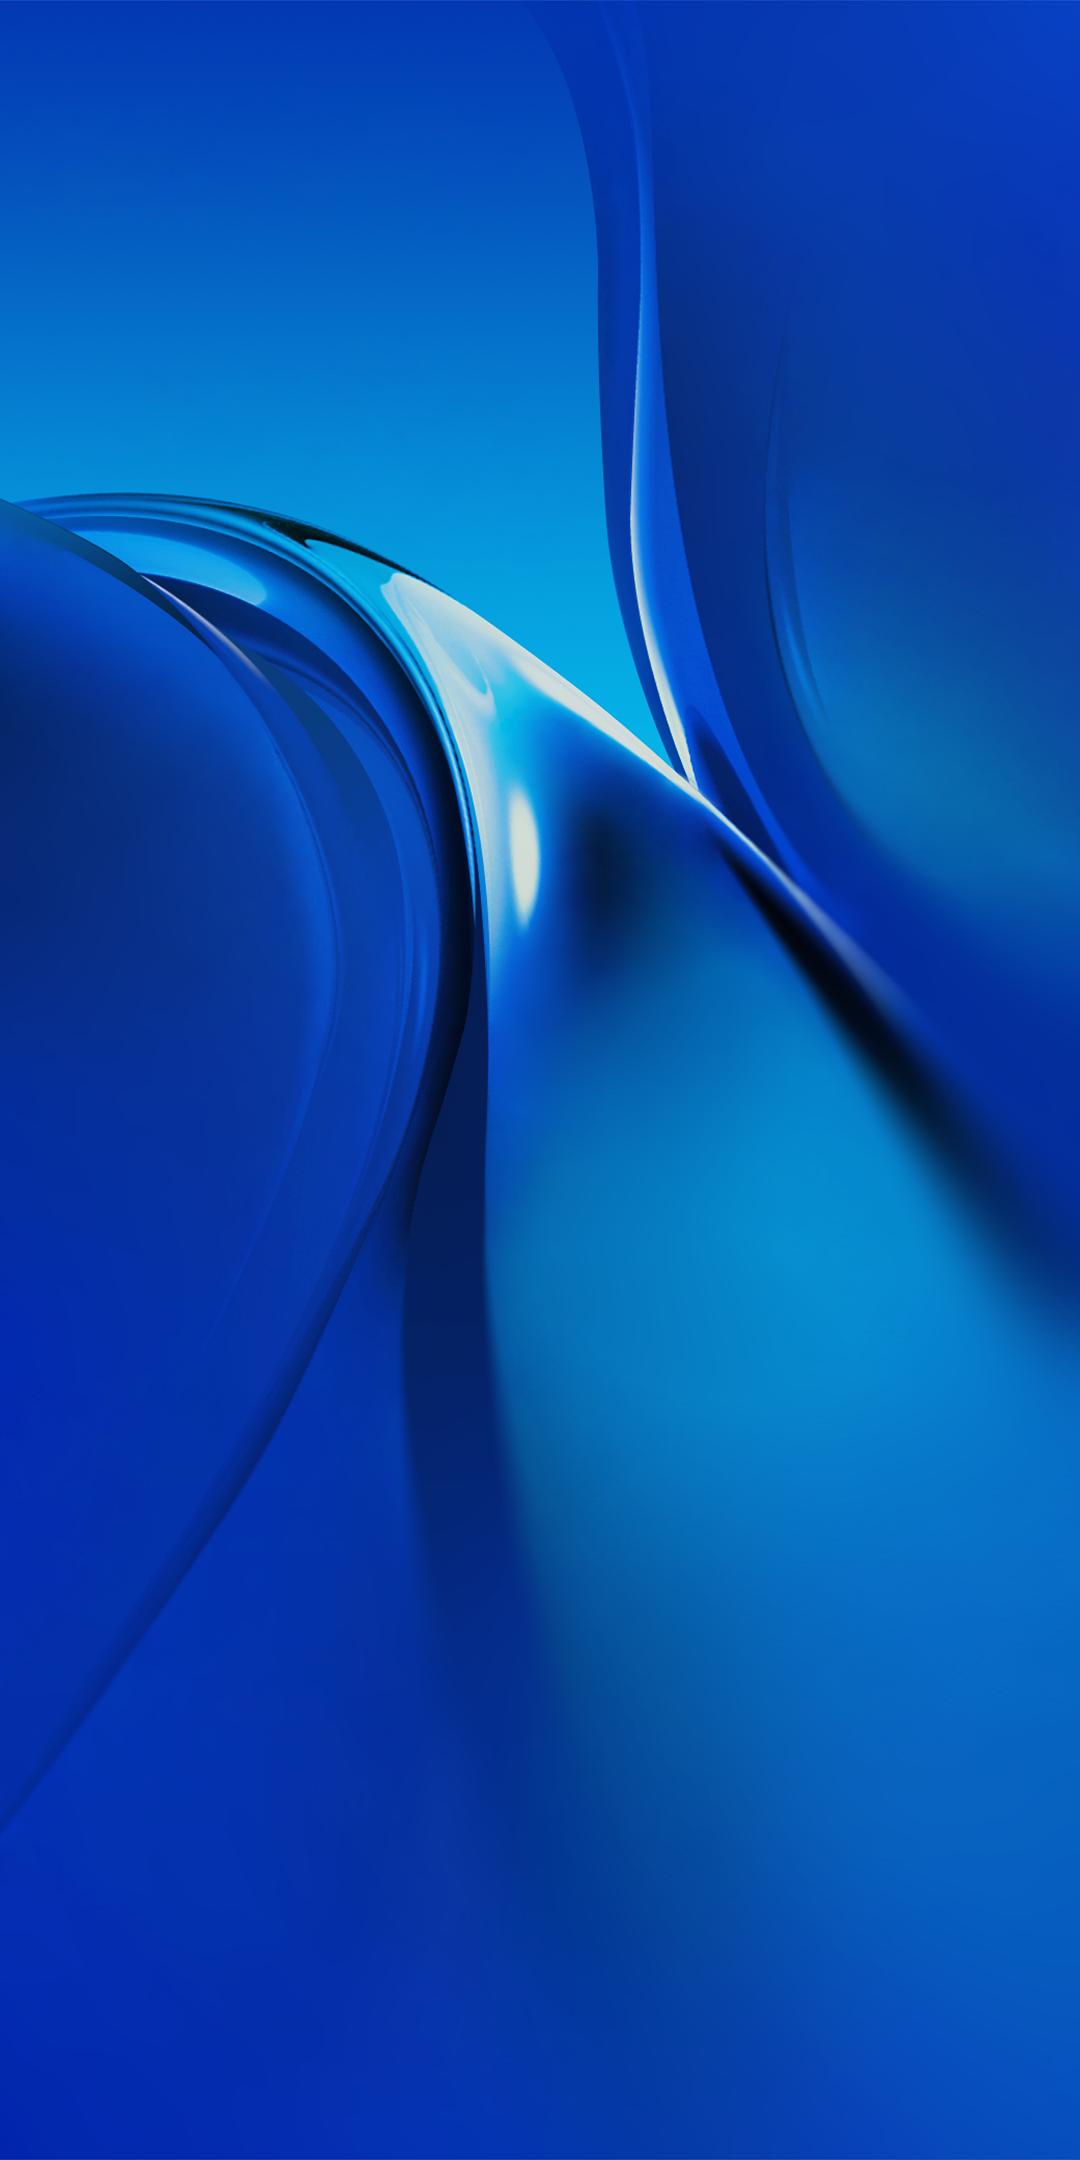 Samsung Galaxy S11 Wallpaper 18 Architecture 1080x2160 Wallpaper Teahub Io